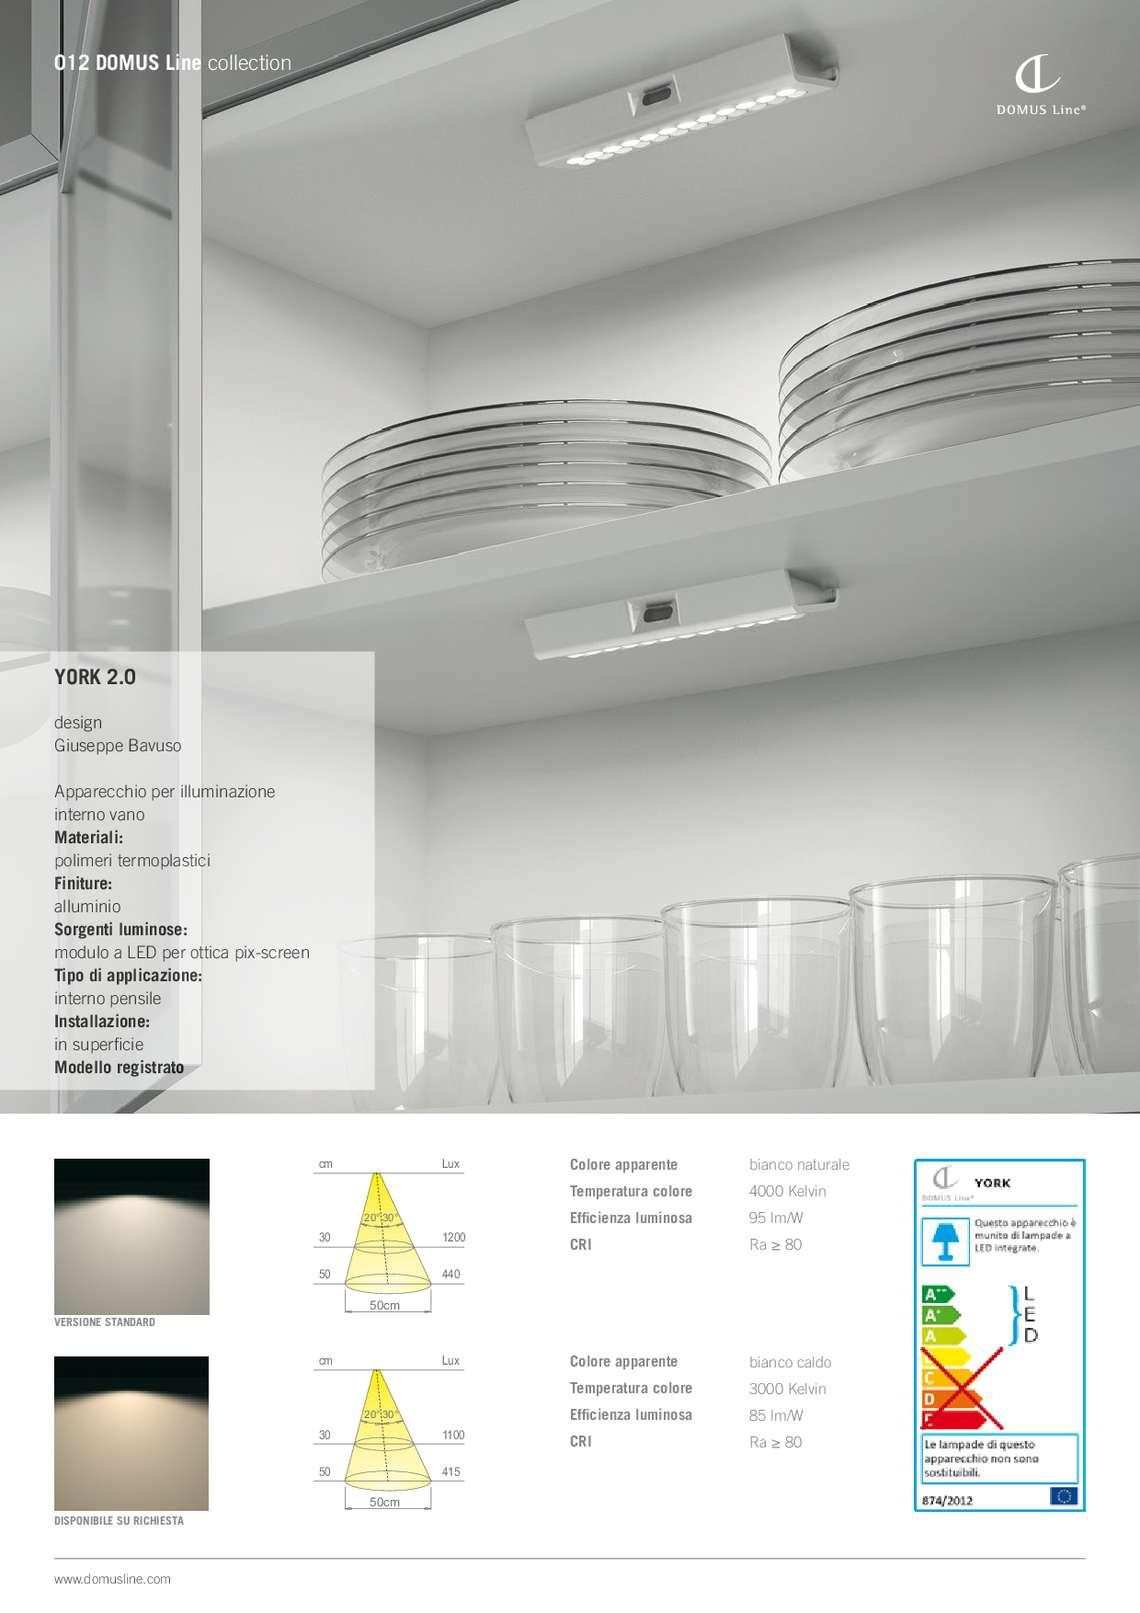 domus-line-illuminazione_26_012.jpg